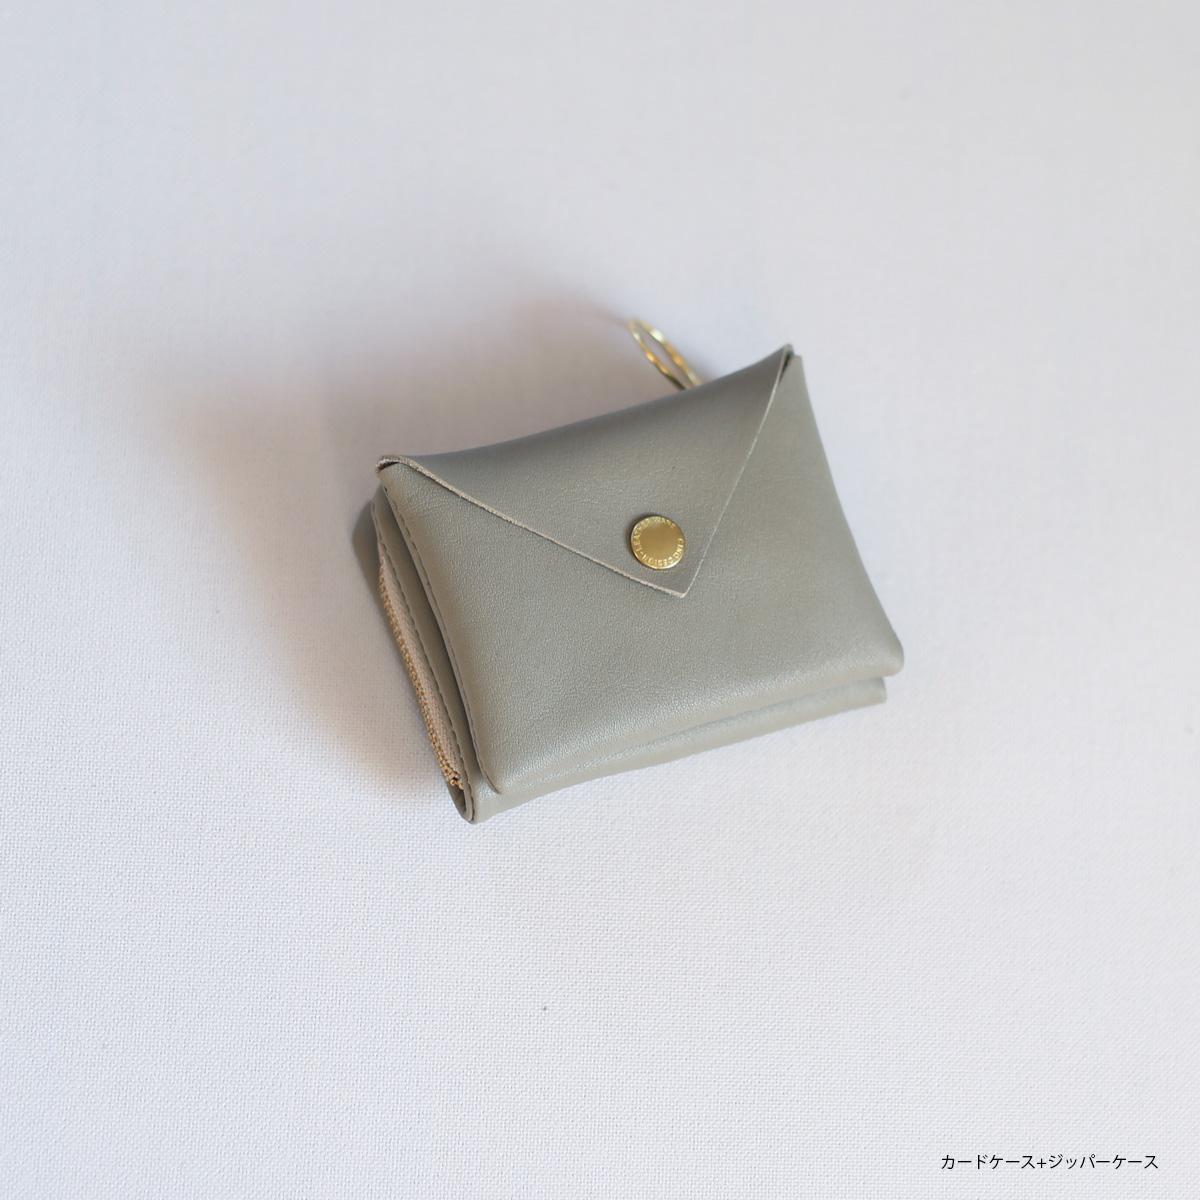 CINQ スナップユニット財布/カードケース/サンク